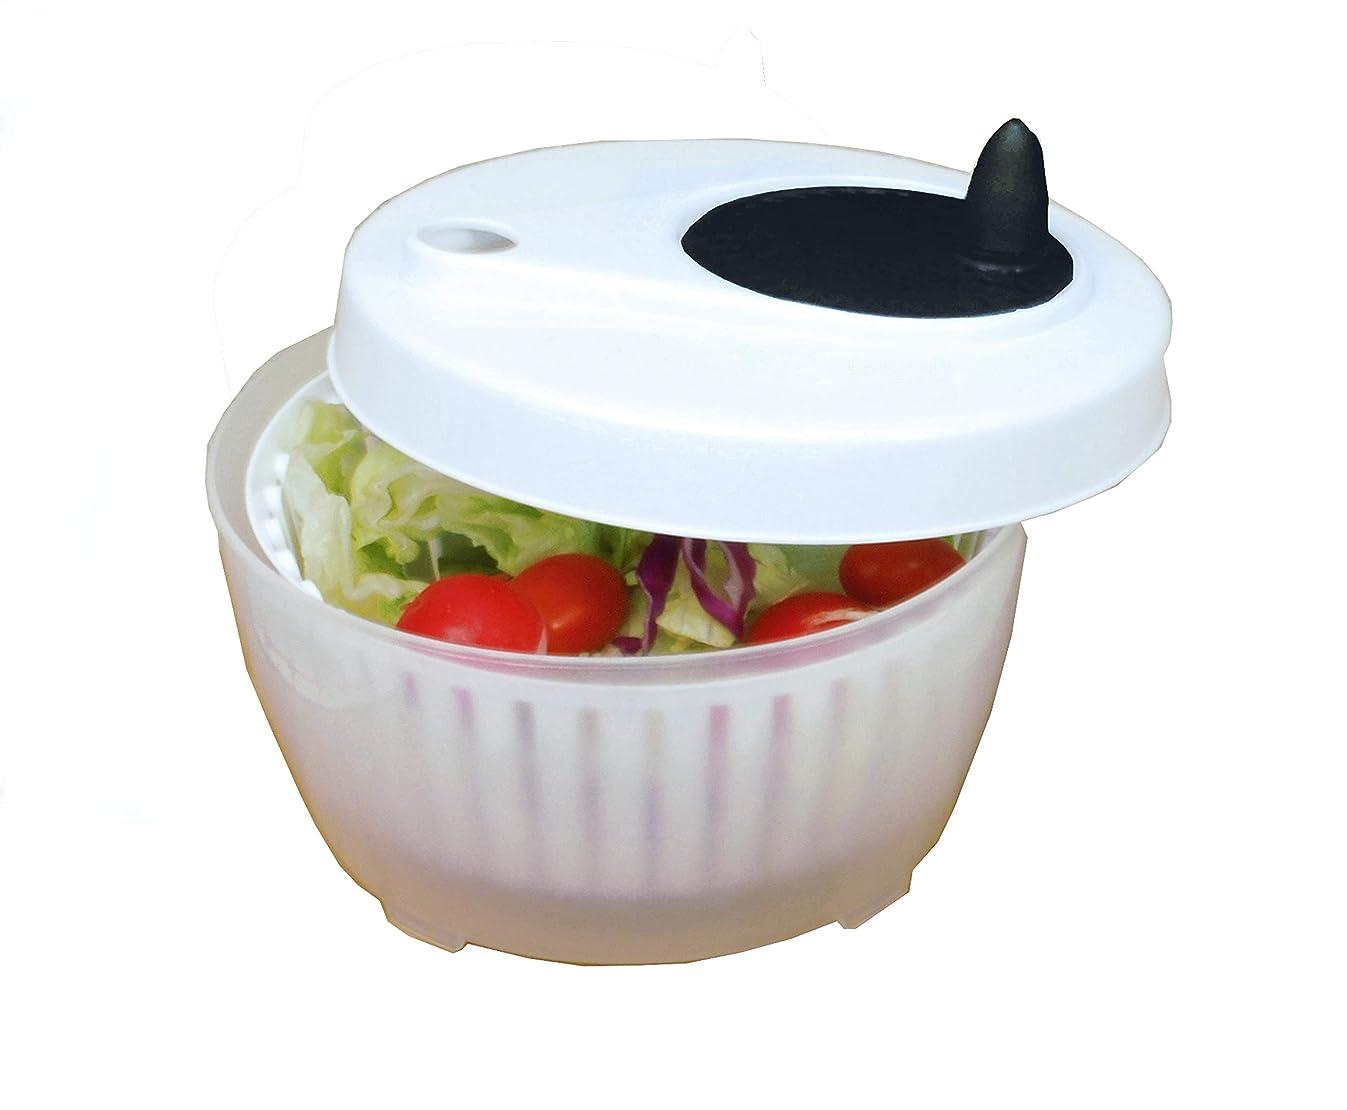 ExcelSteel 602 Functional, Fruits, Vegetables Mini Salad Spinner, 1.4 Qt, White